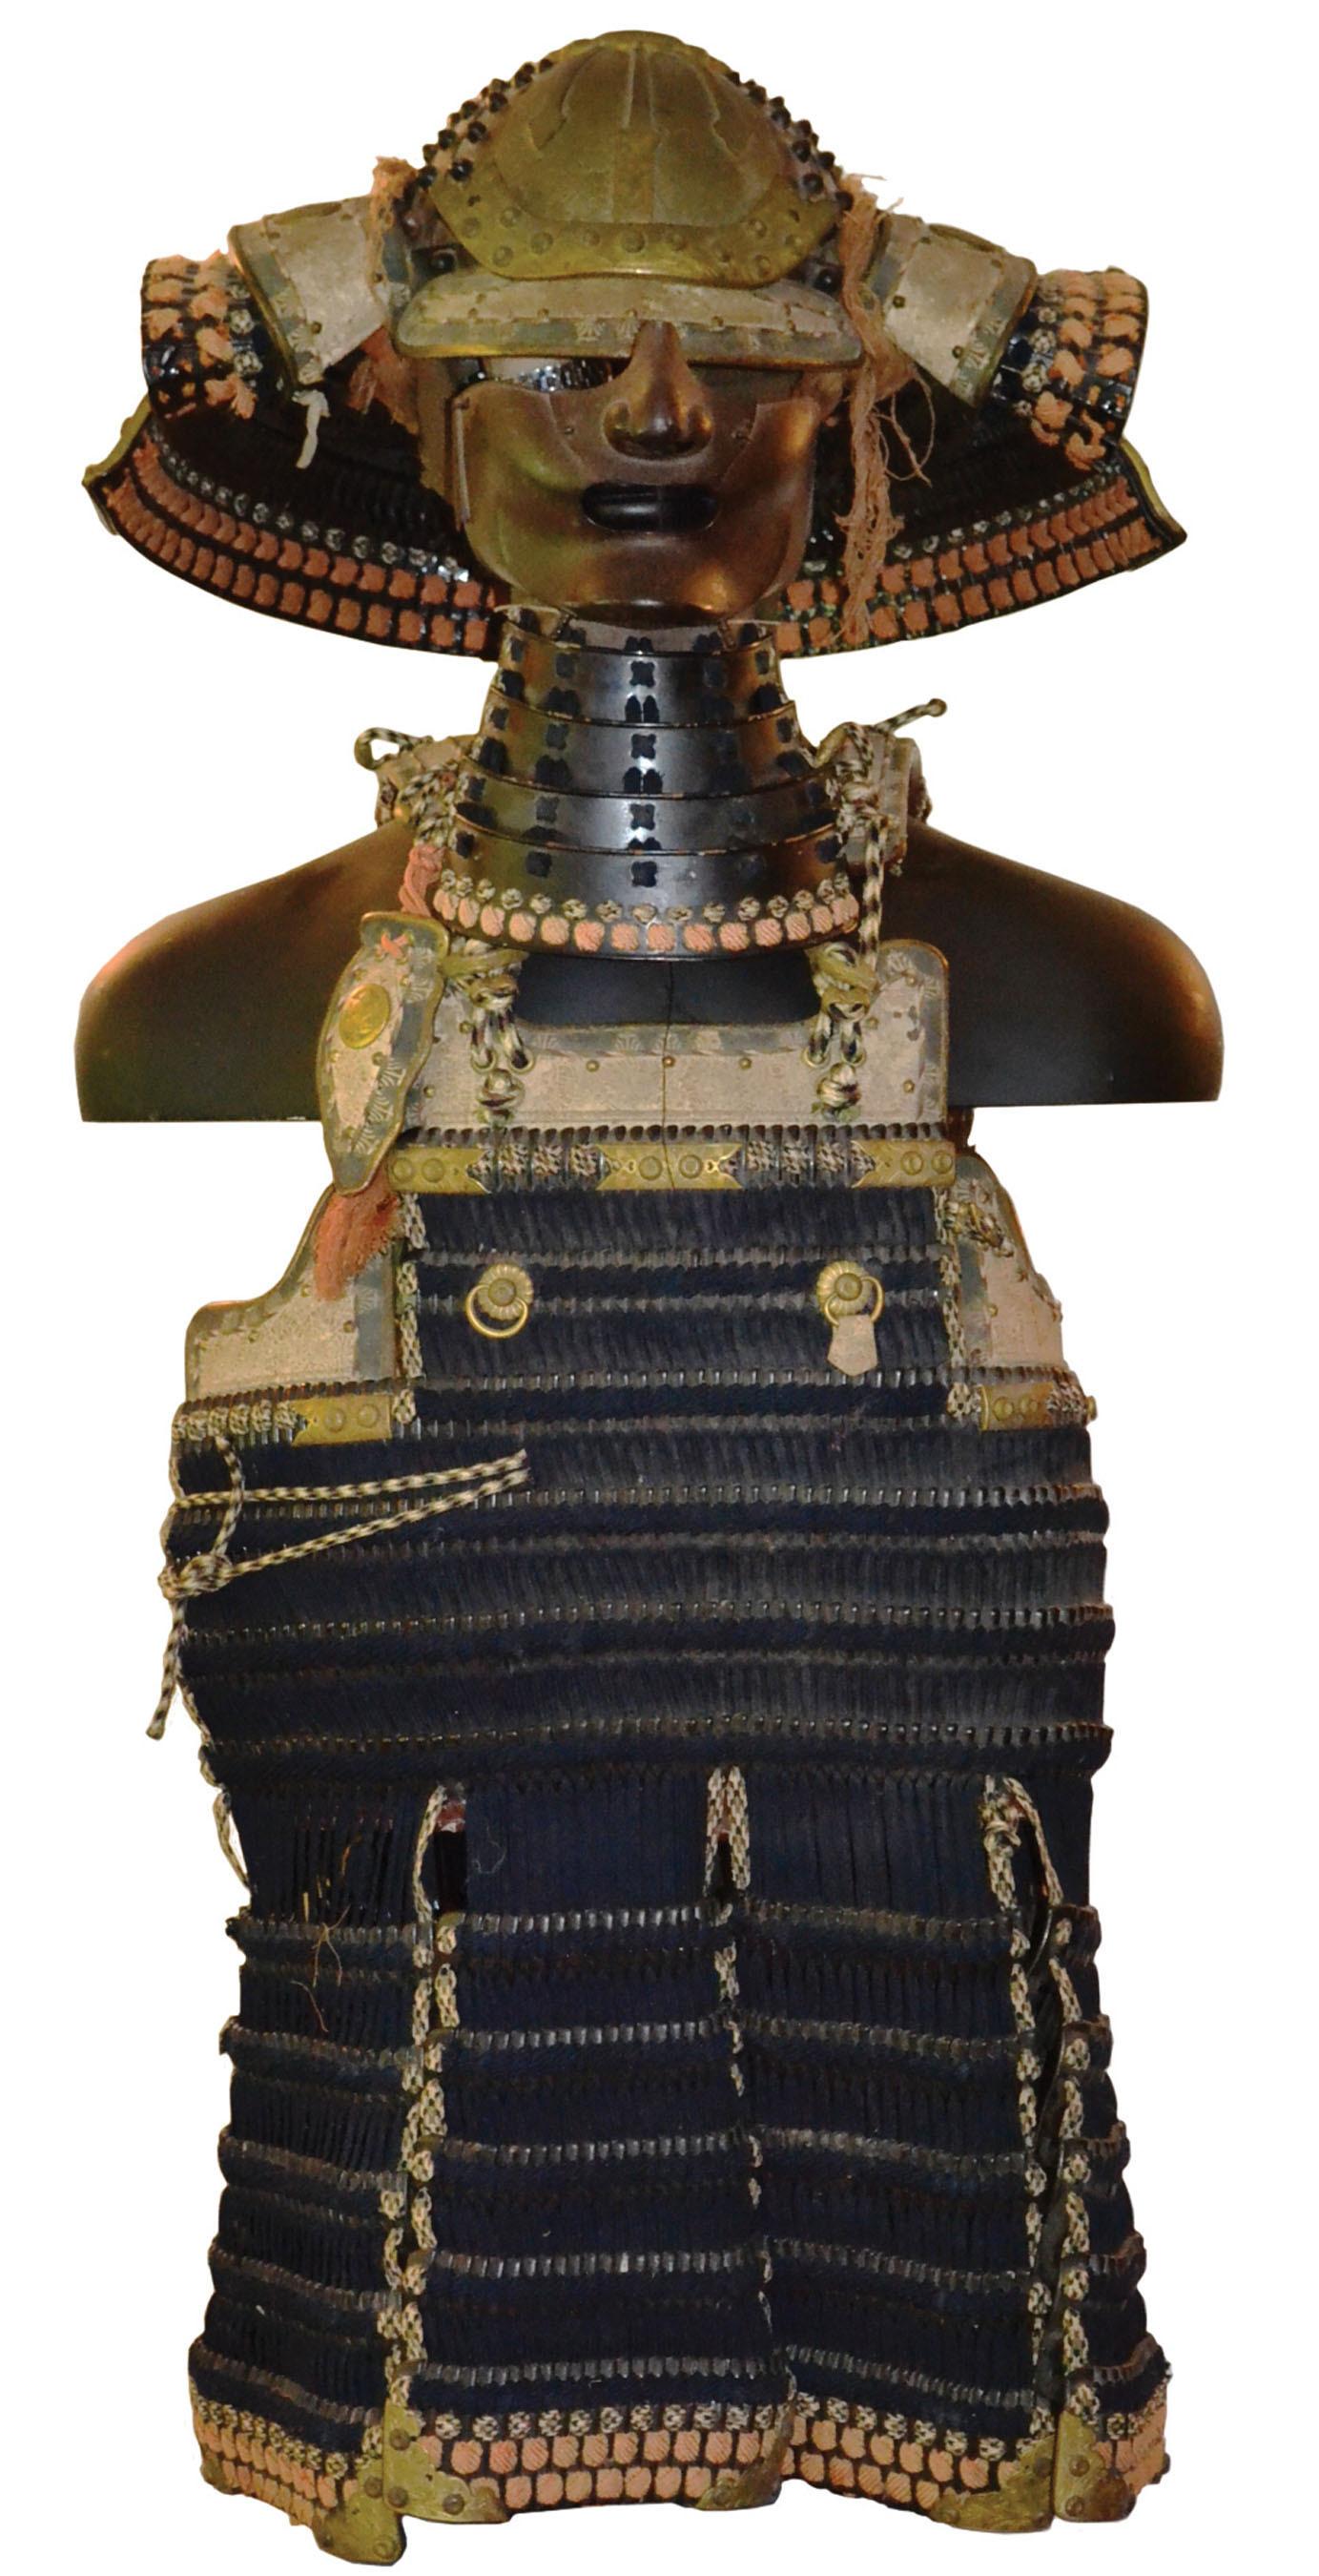 19th Century Samurai Armor. (PRNewsFoto/Curran Miller Auction/Realty, Inc.) (PRNewsFoto/CURRAN MILLER AUCTION...)